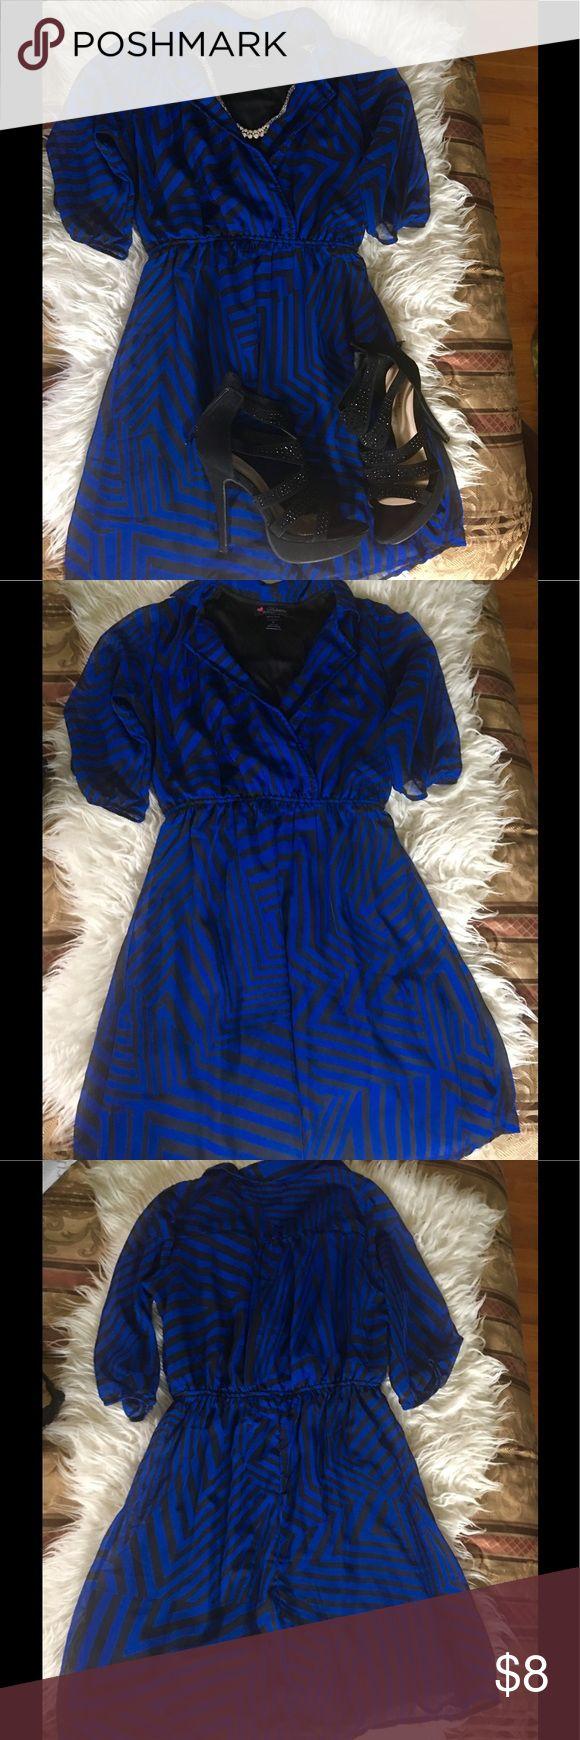 Black & Blue Chevron Dress 💙 Beautiful chevron print dress size S....Worn once Dresses Mini